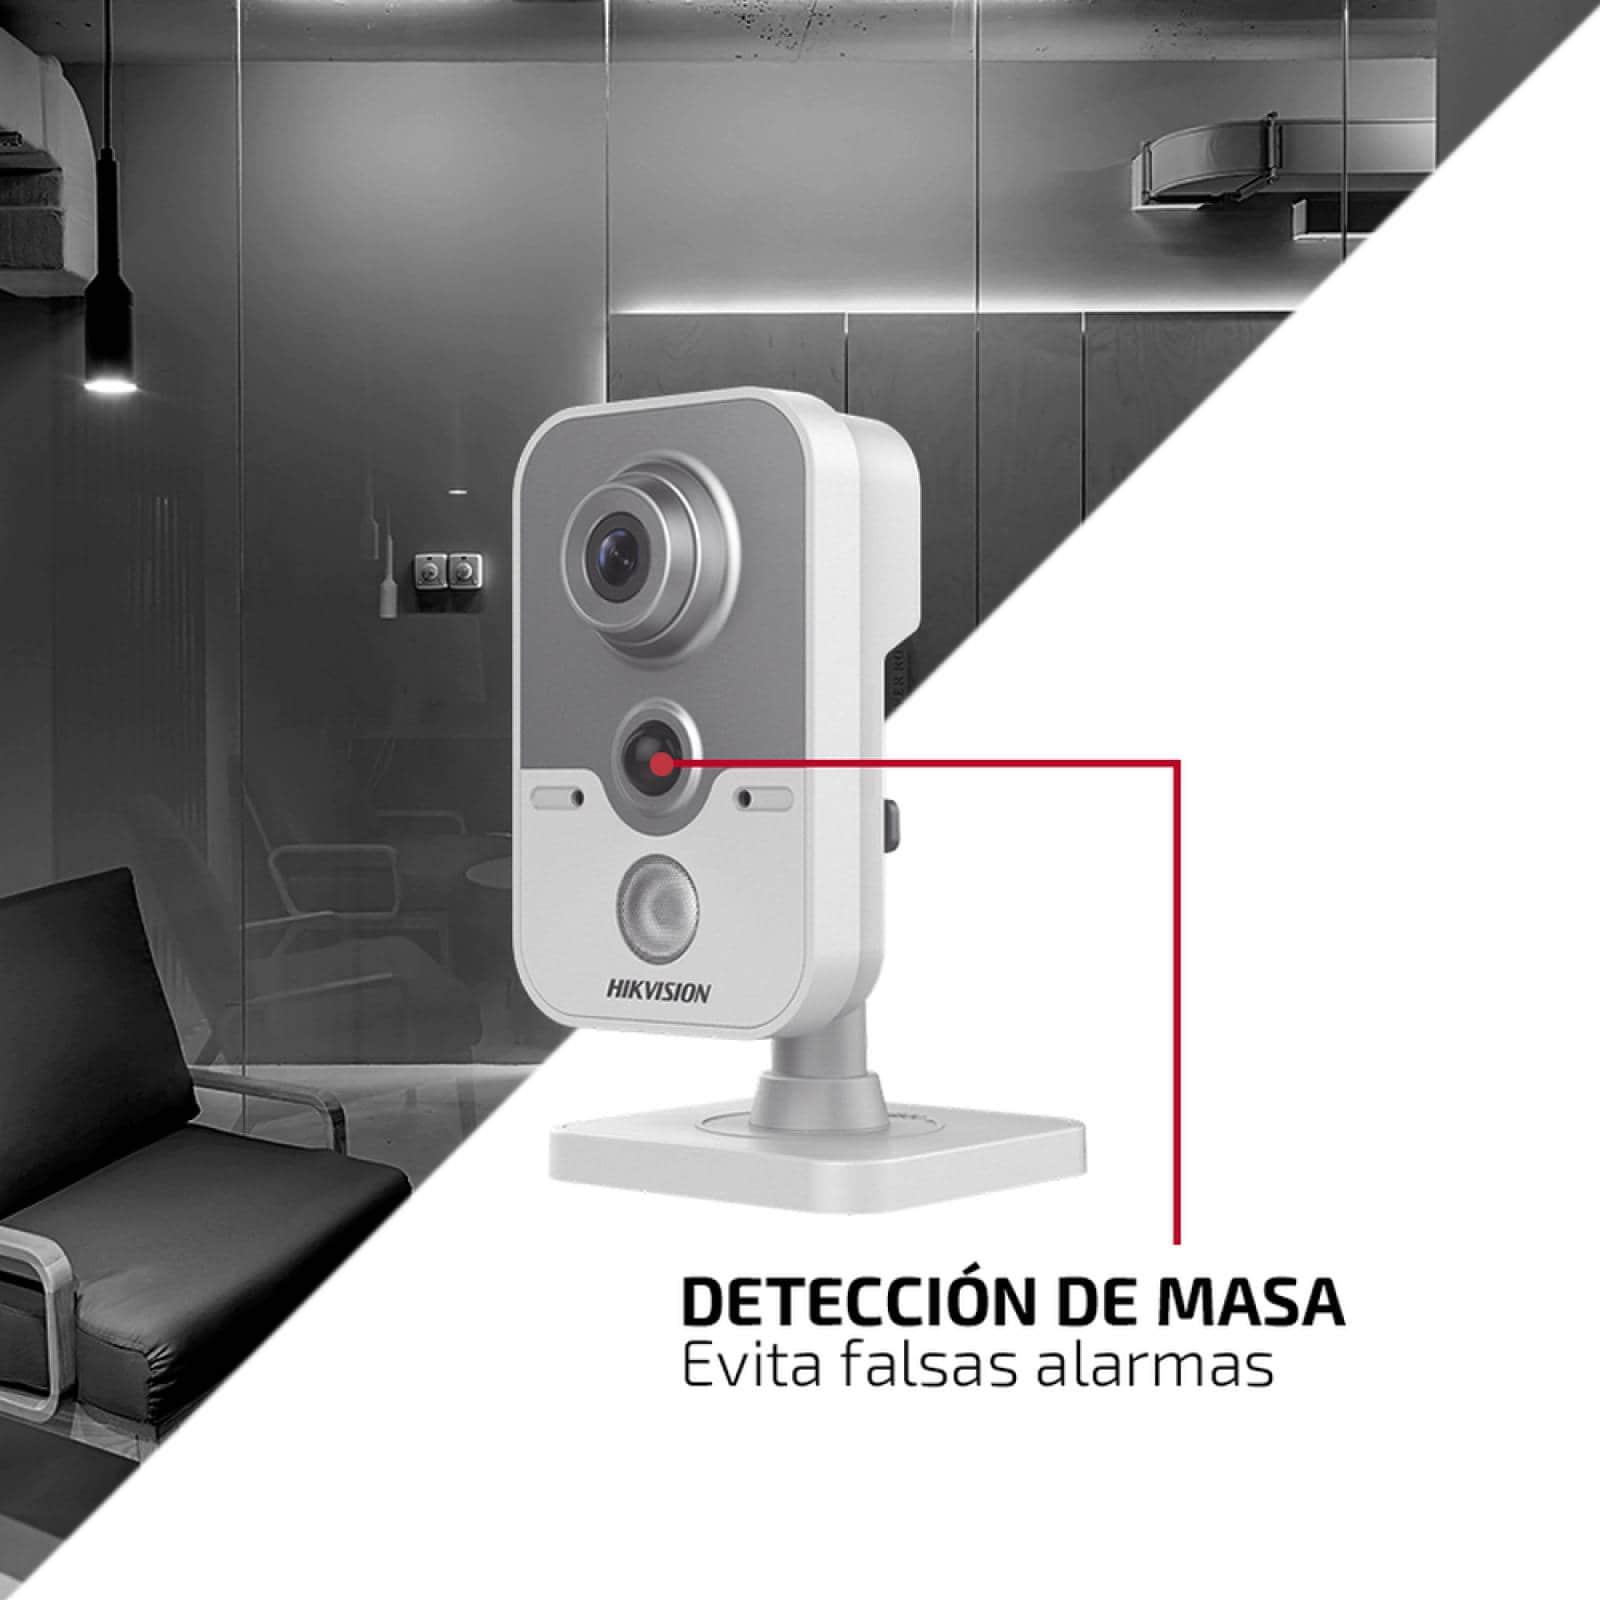 Cubo TURBO 1080p / TECNOLOGÍA PIR / Gran Angular 103º / Lente 2.8 mm / IR EXIR Inteligente 20 mts / Micrófono Integrado / Interior/ HIKVISION